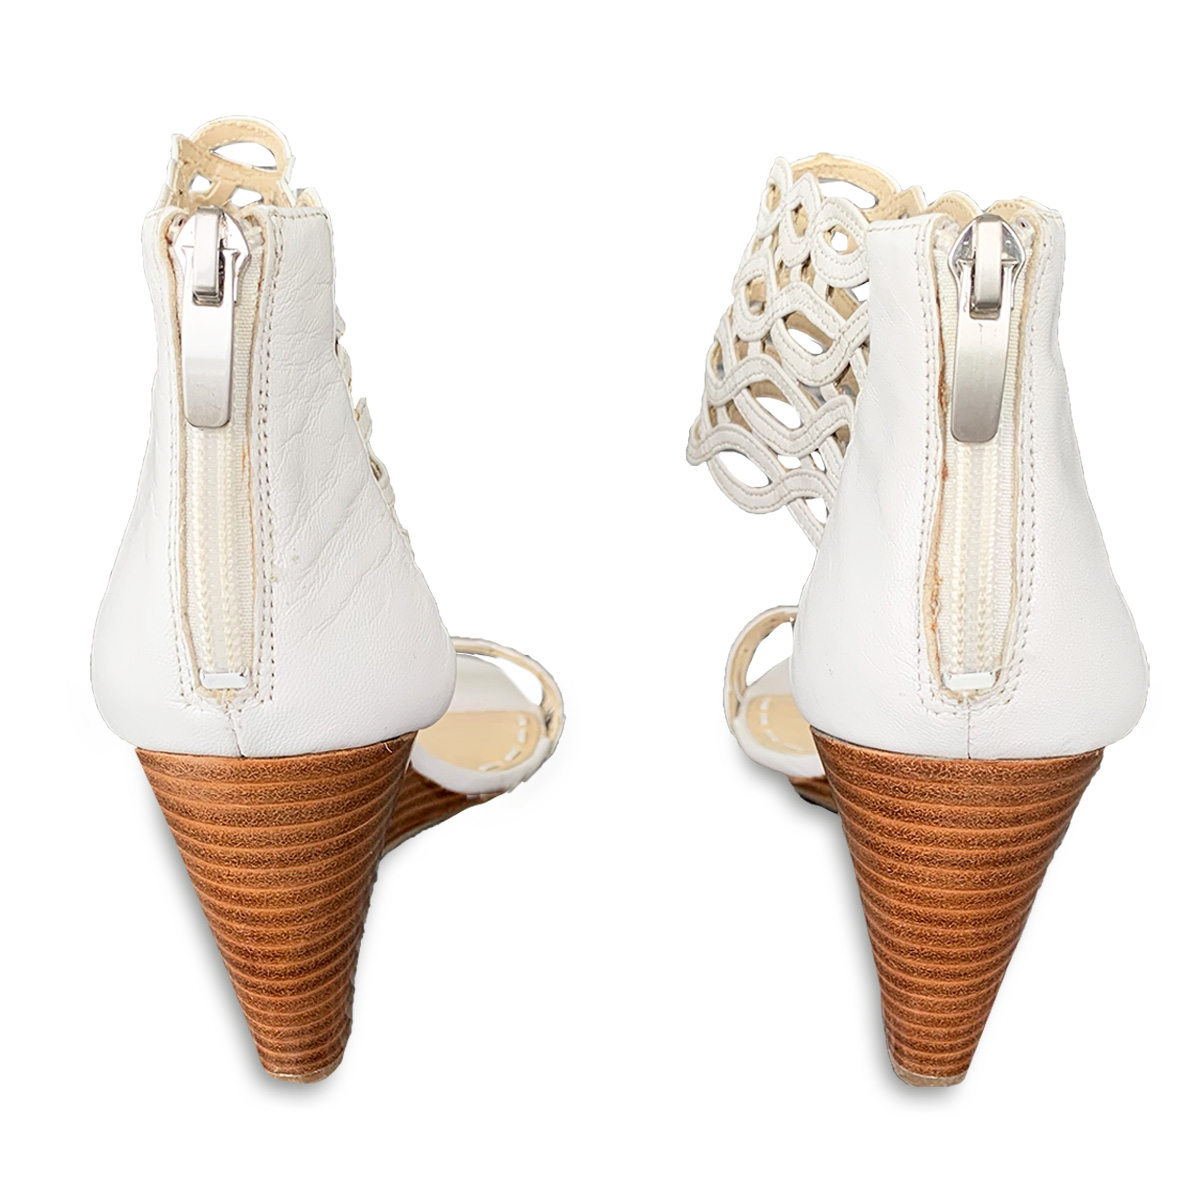 vintage white sandals